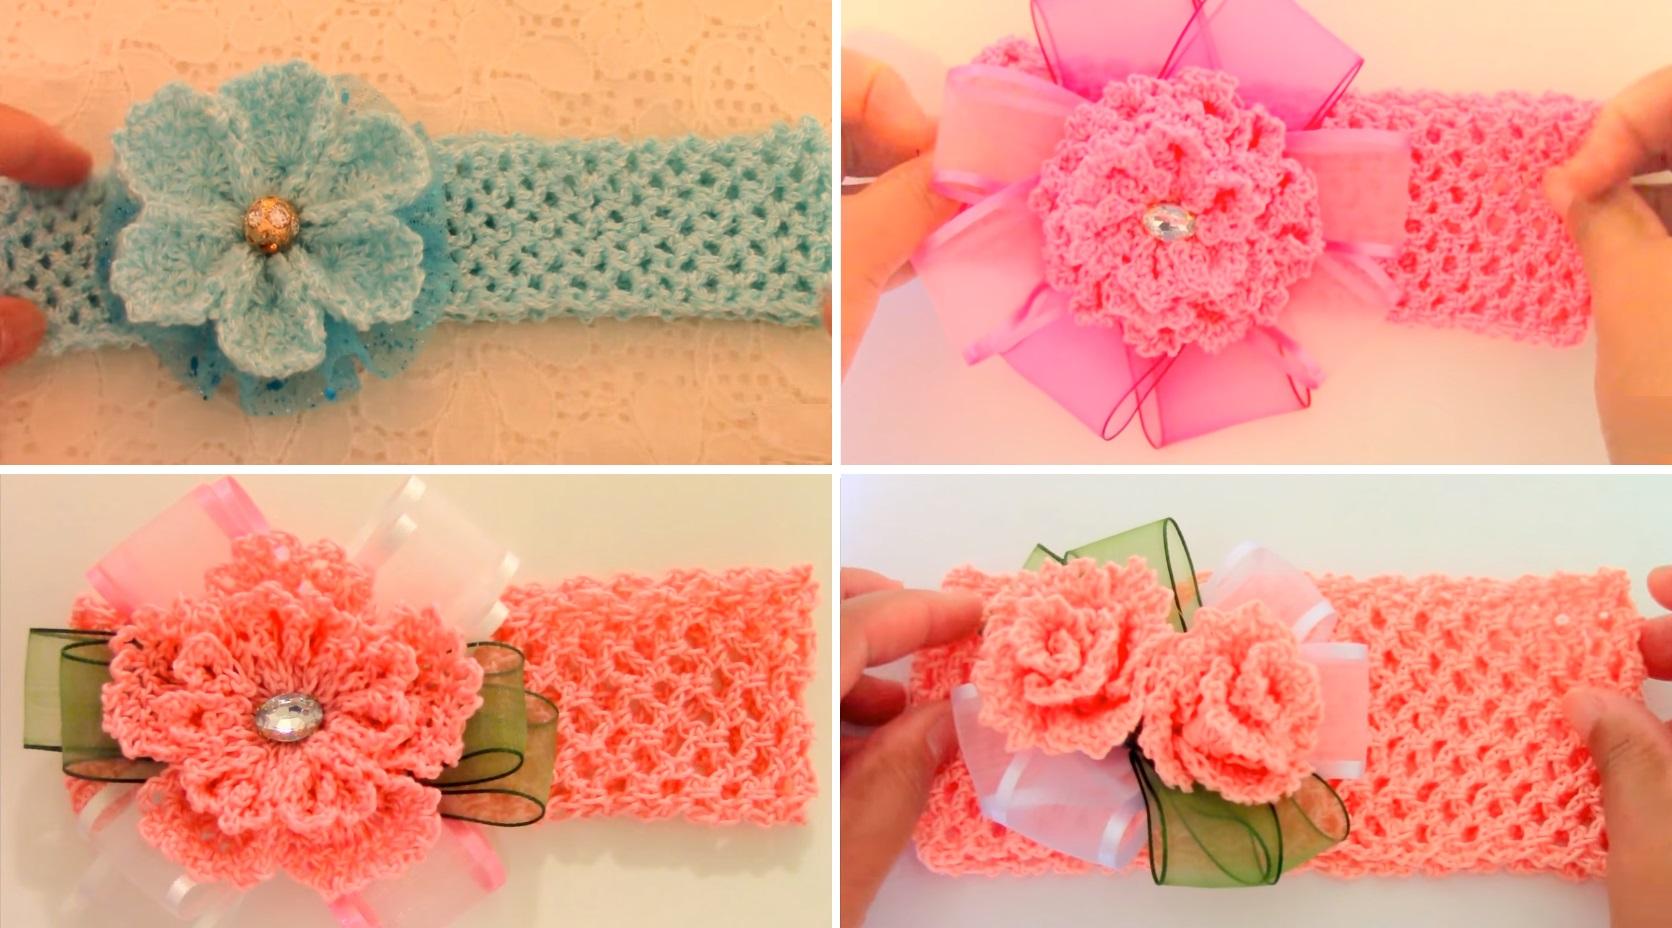 Crochet Headbands With Beautiful Flowers Design Peak